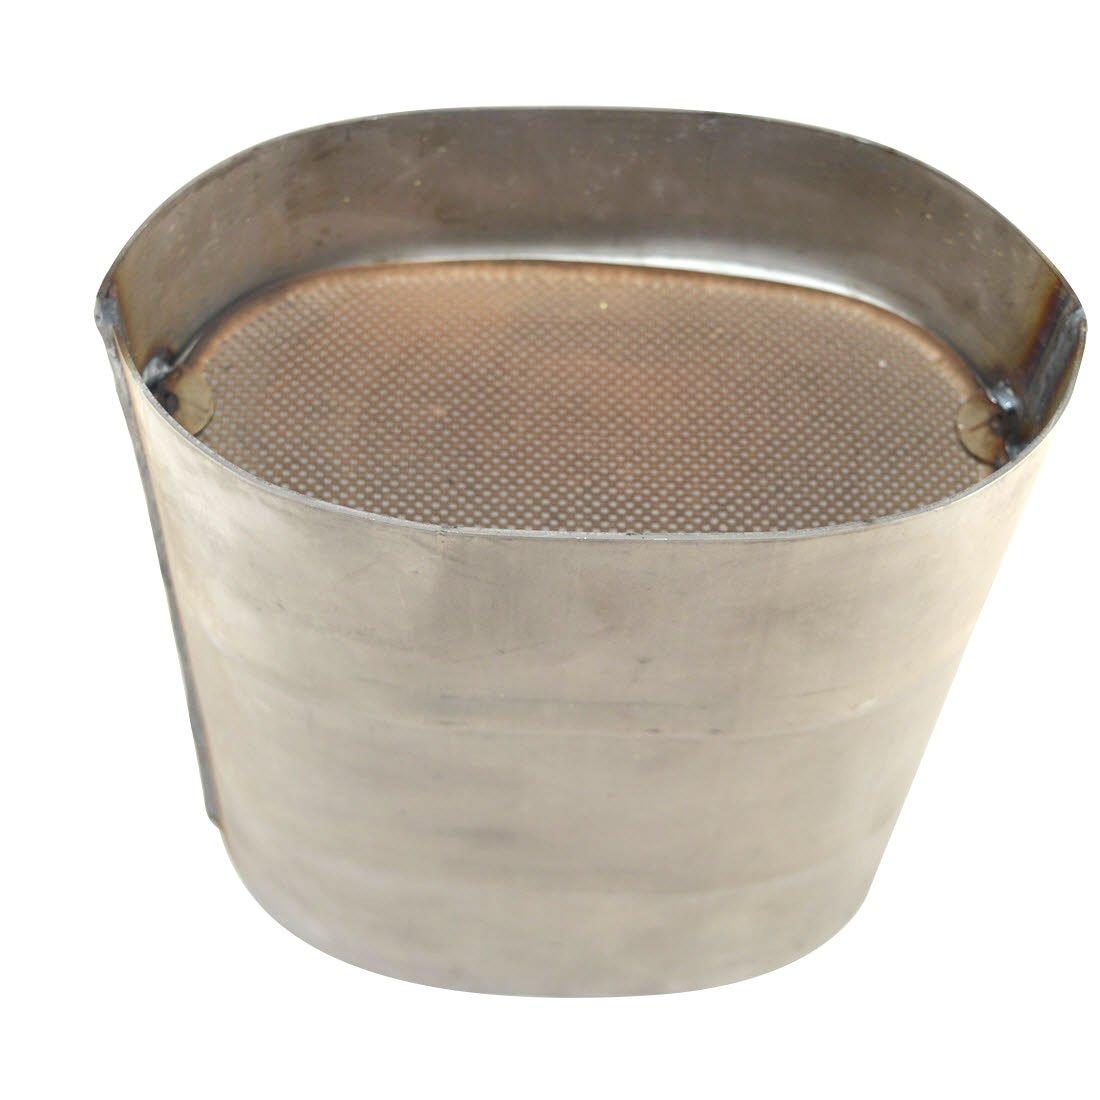 VAG 1.6TDI Weld in dpf filter